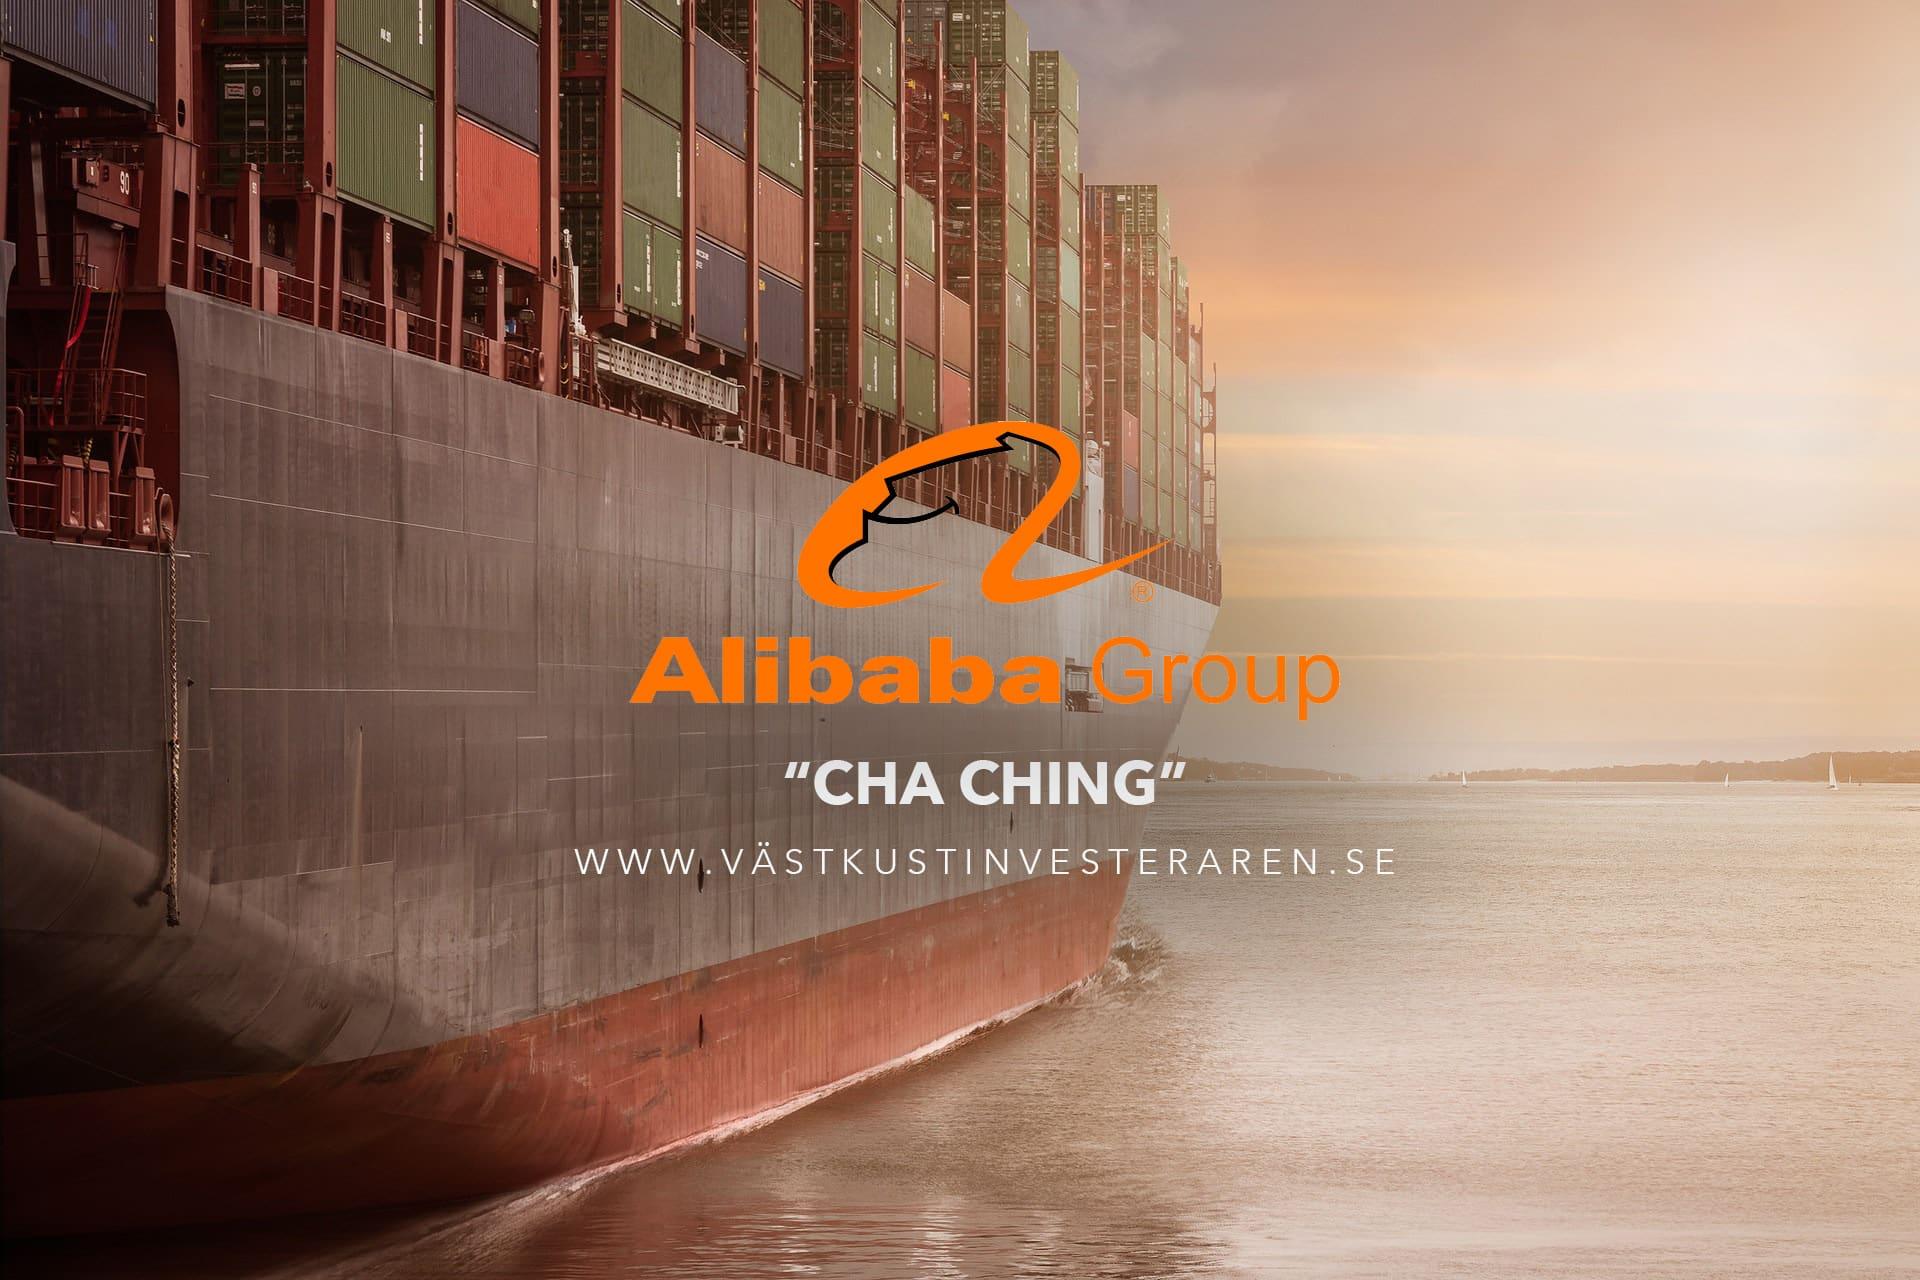 alibaba analys aktieanalys